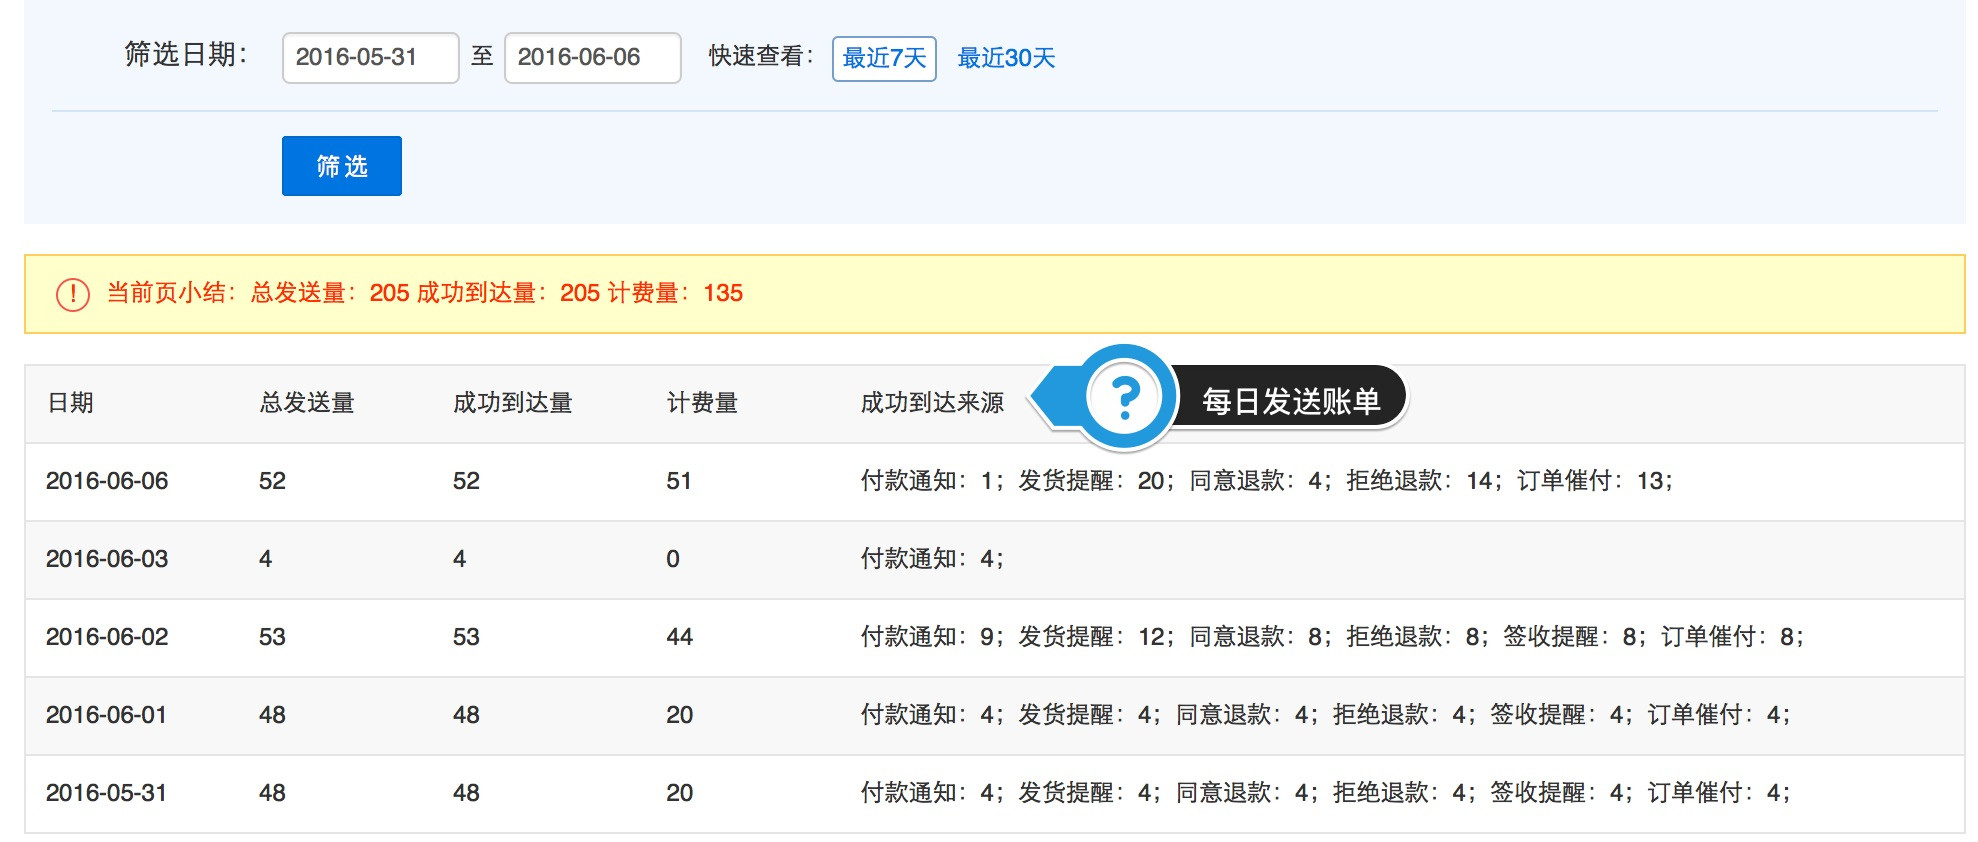 Banners_and_Alerts_和_消息推送_-_起码运动馆.jpg